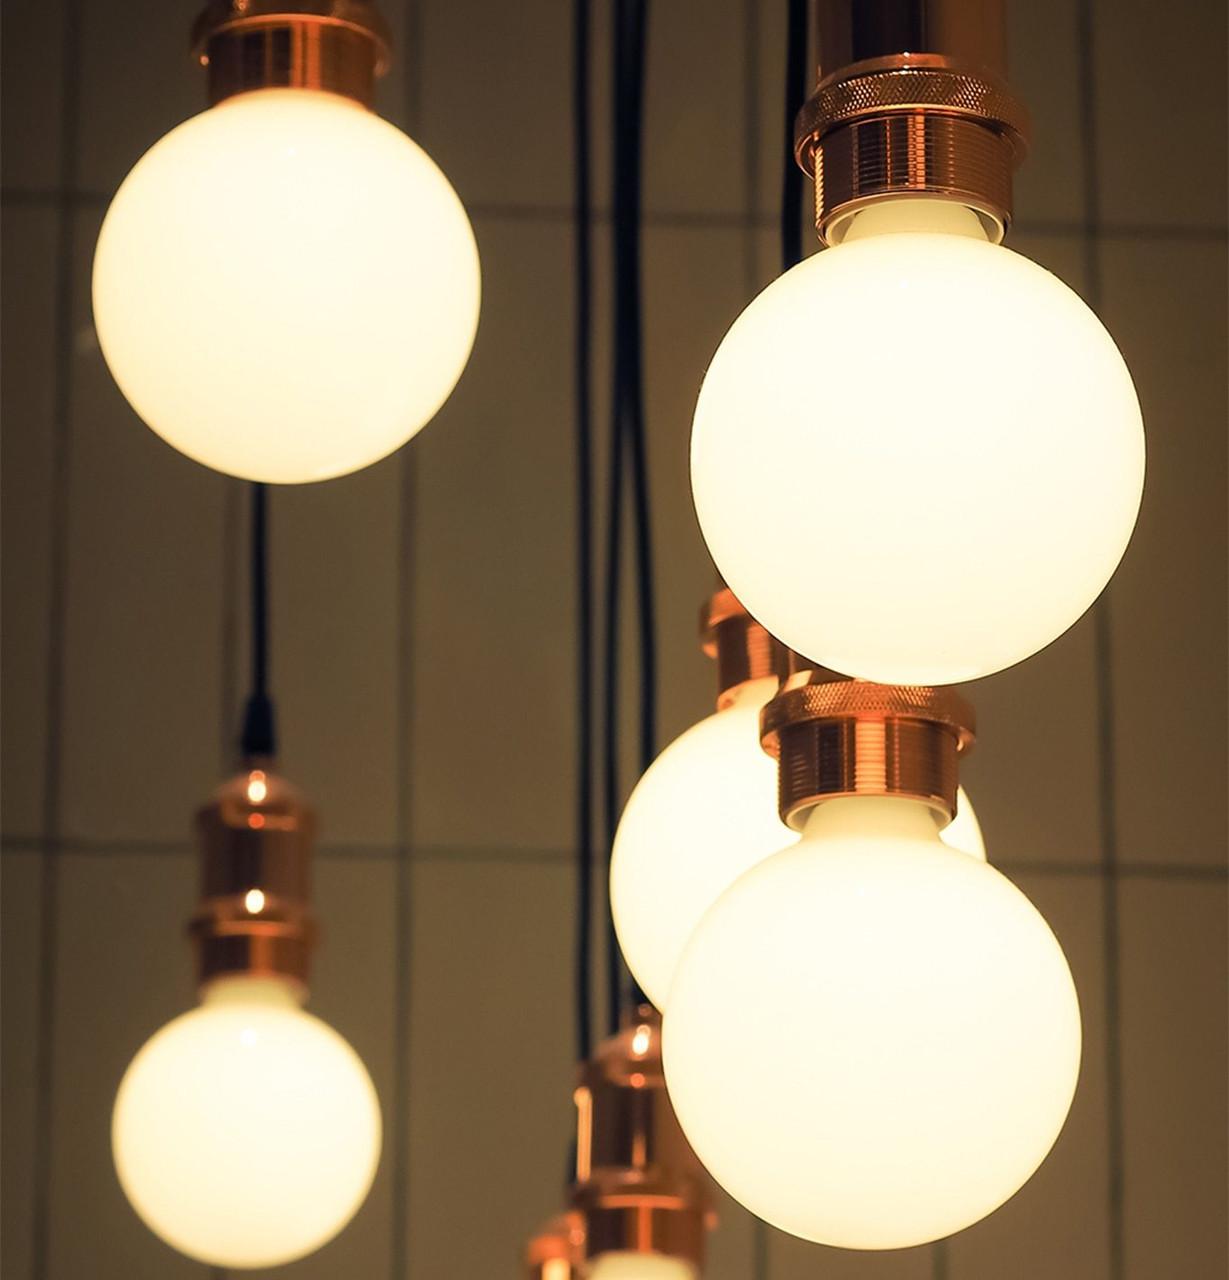 Crompton Lamps LED G95 E27 Light Bulbs